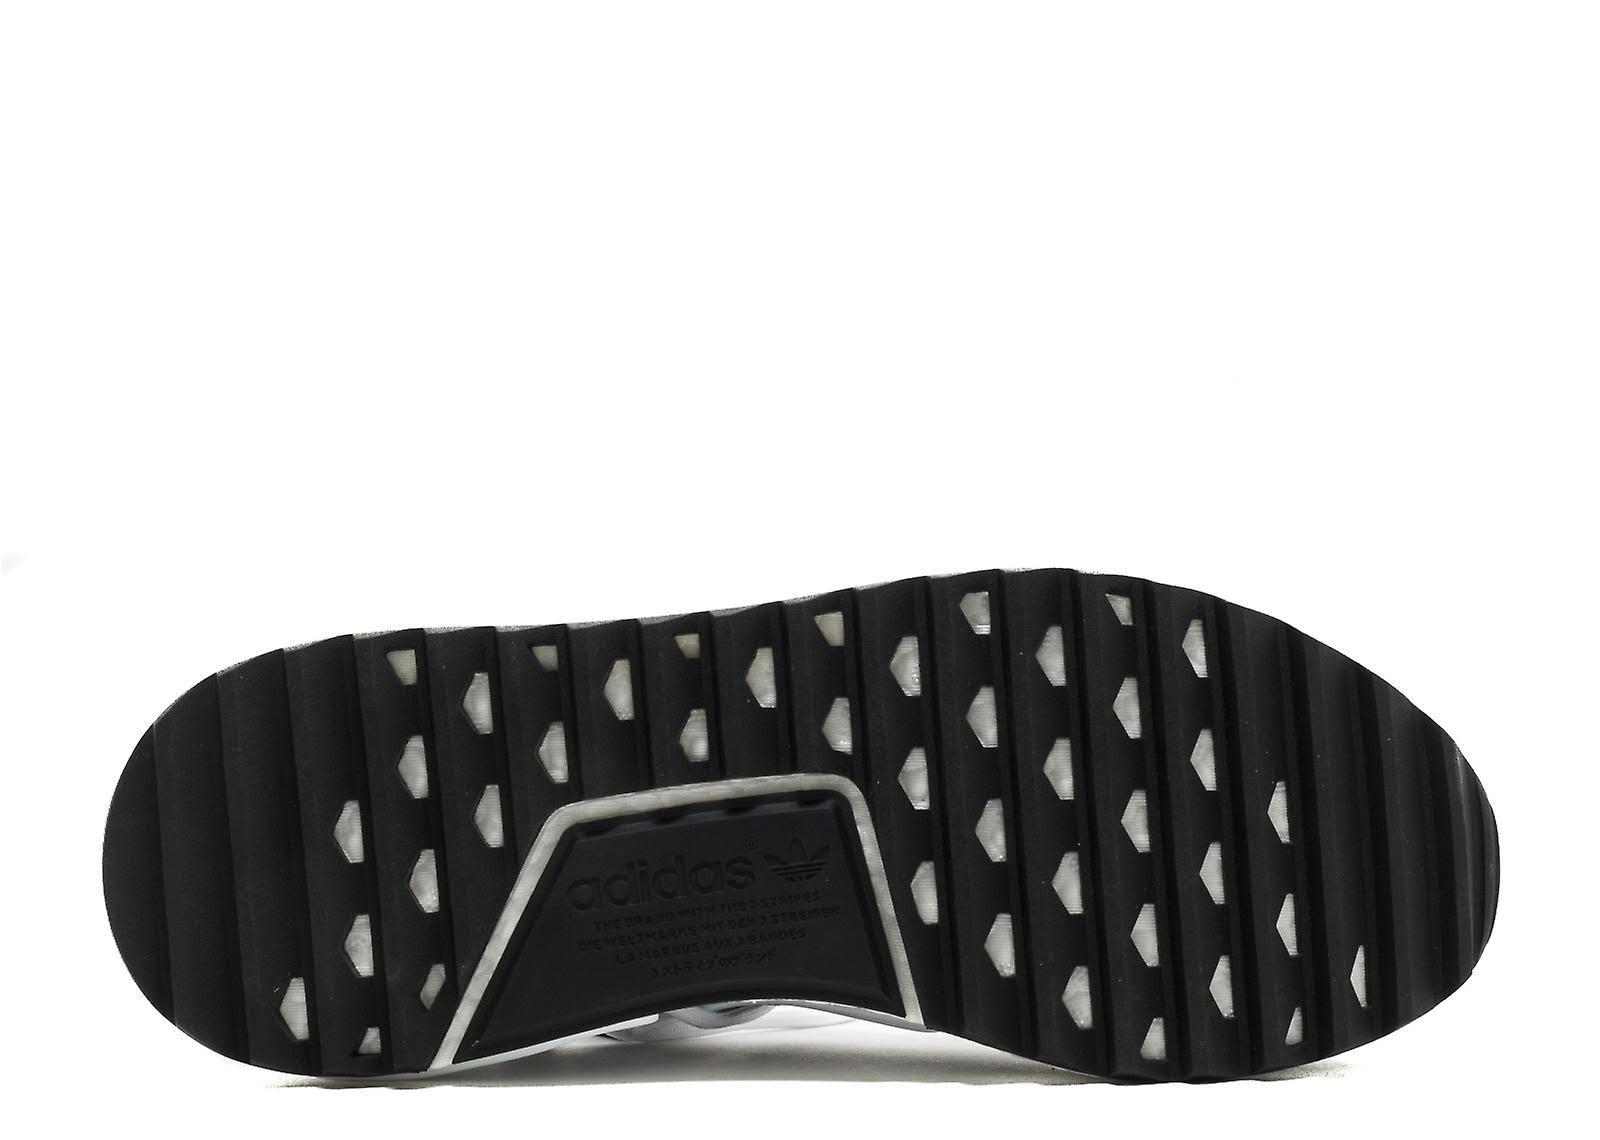 Adidas Pw Human Race NMD TR 'Pharrell' - Ac7359 - Scarpe 4 UK  67pkzf